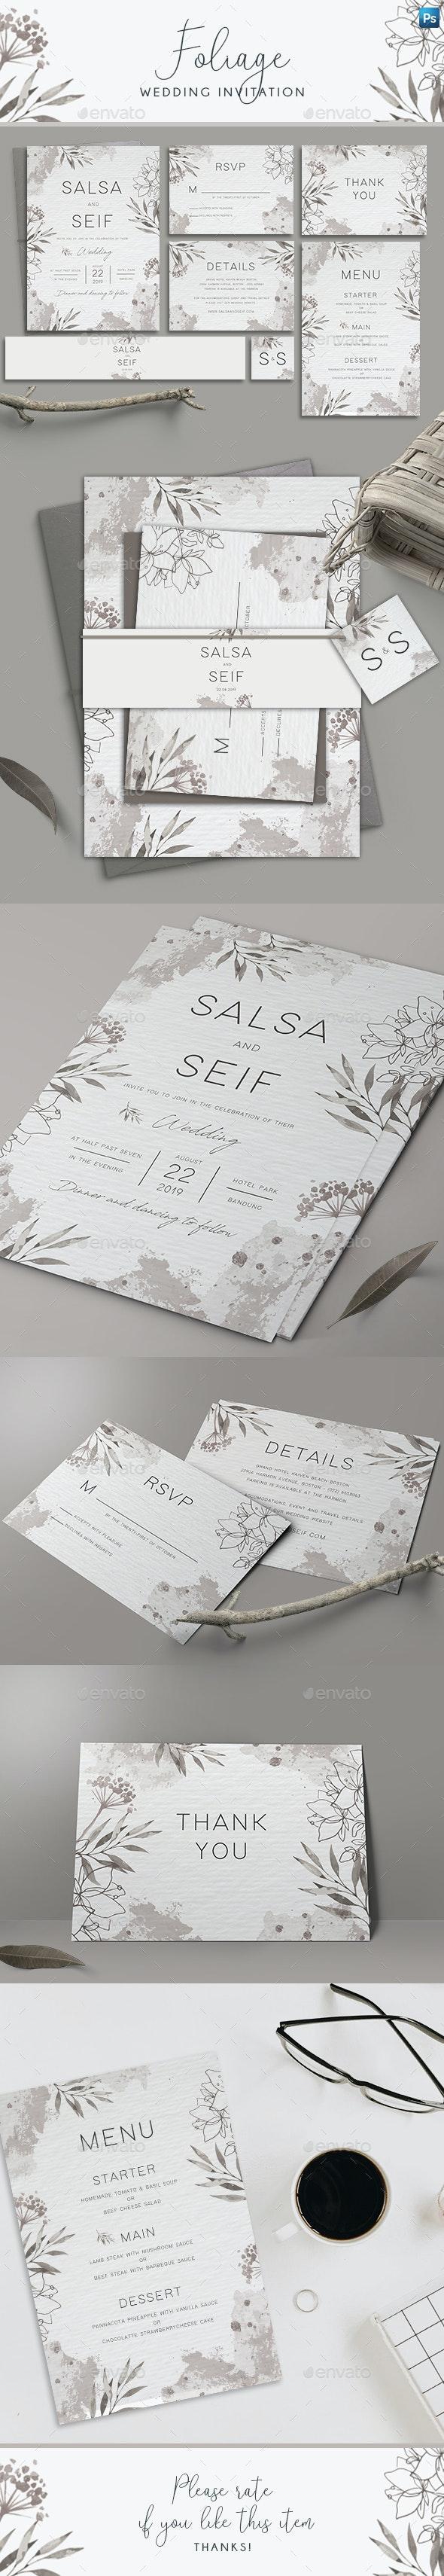 Monochrome Foliage Wedding Invitation - Weddings Cards & Invites